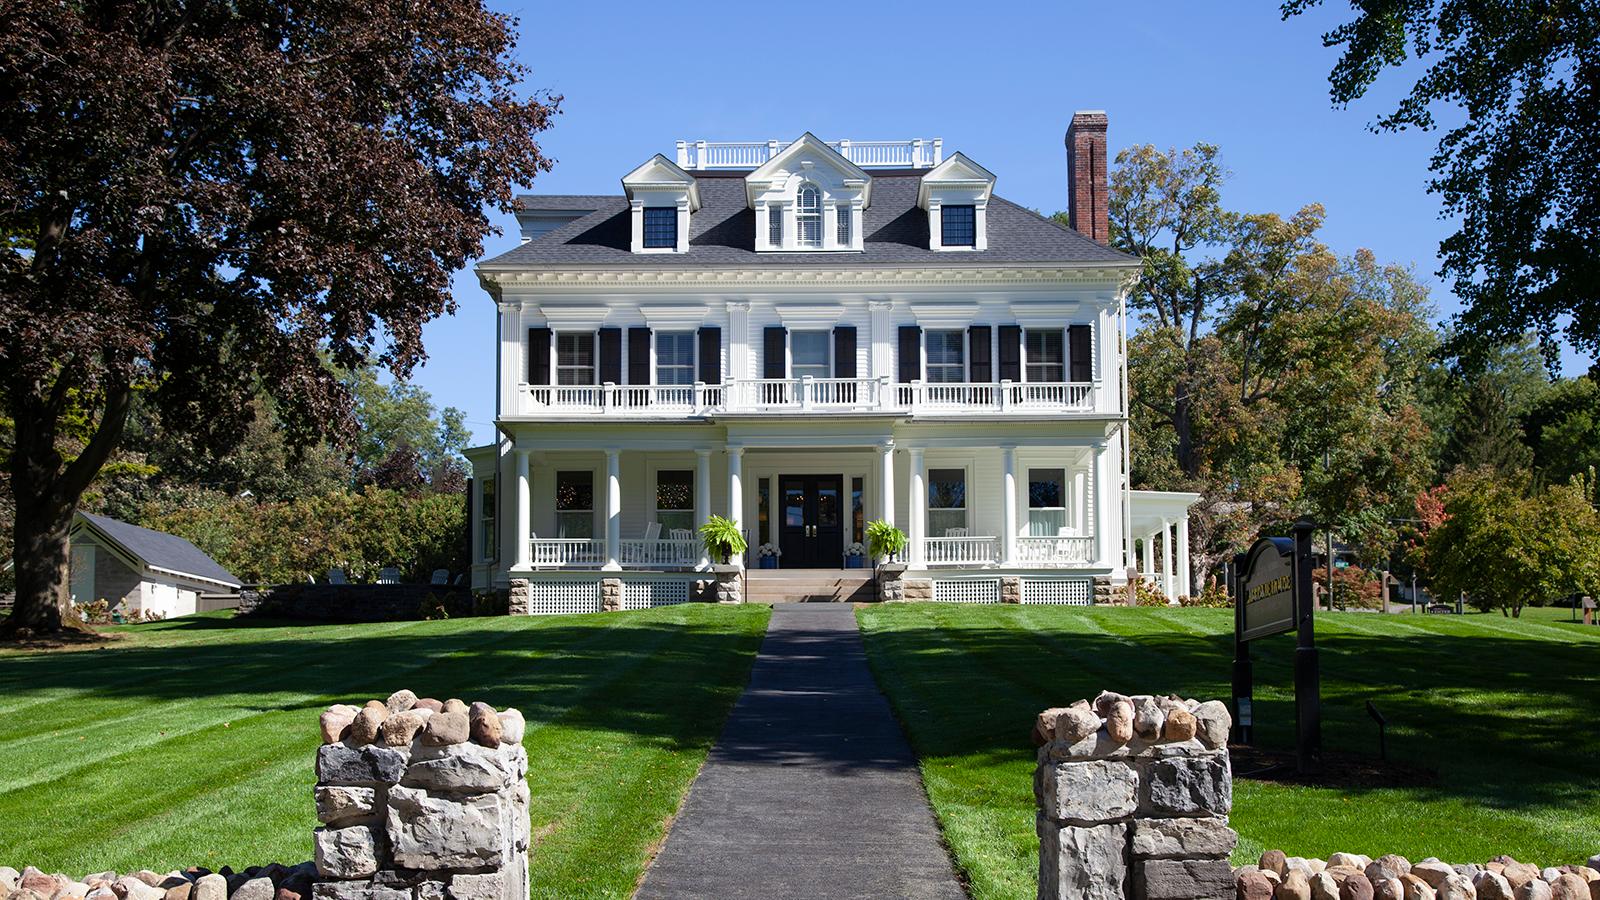 Image of Exterior of Zabriske House, the Inns of Aurora, Aurora, New York, Overview